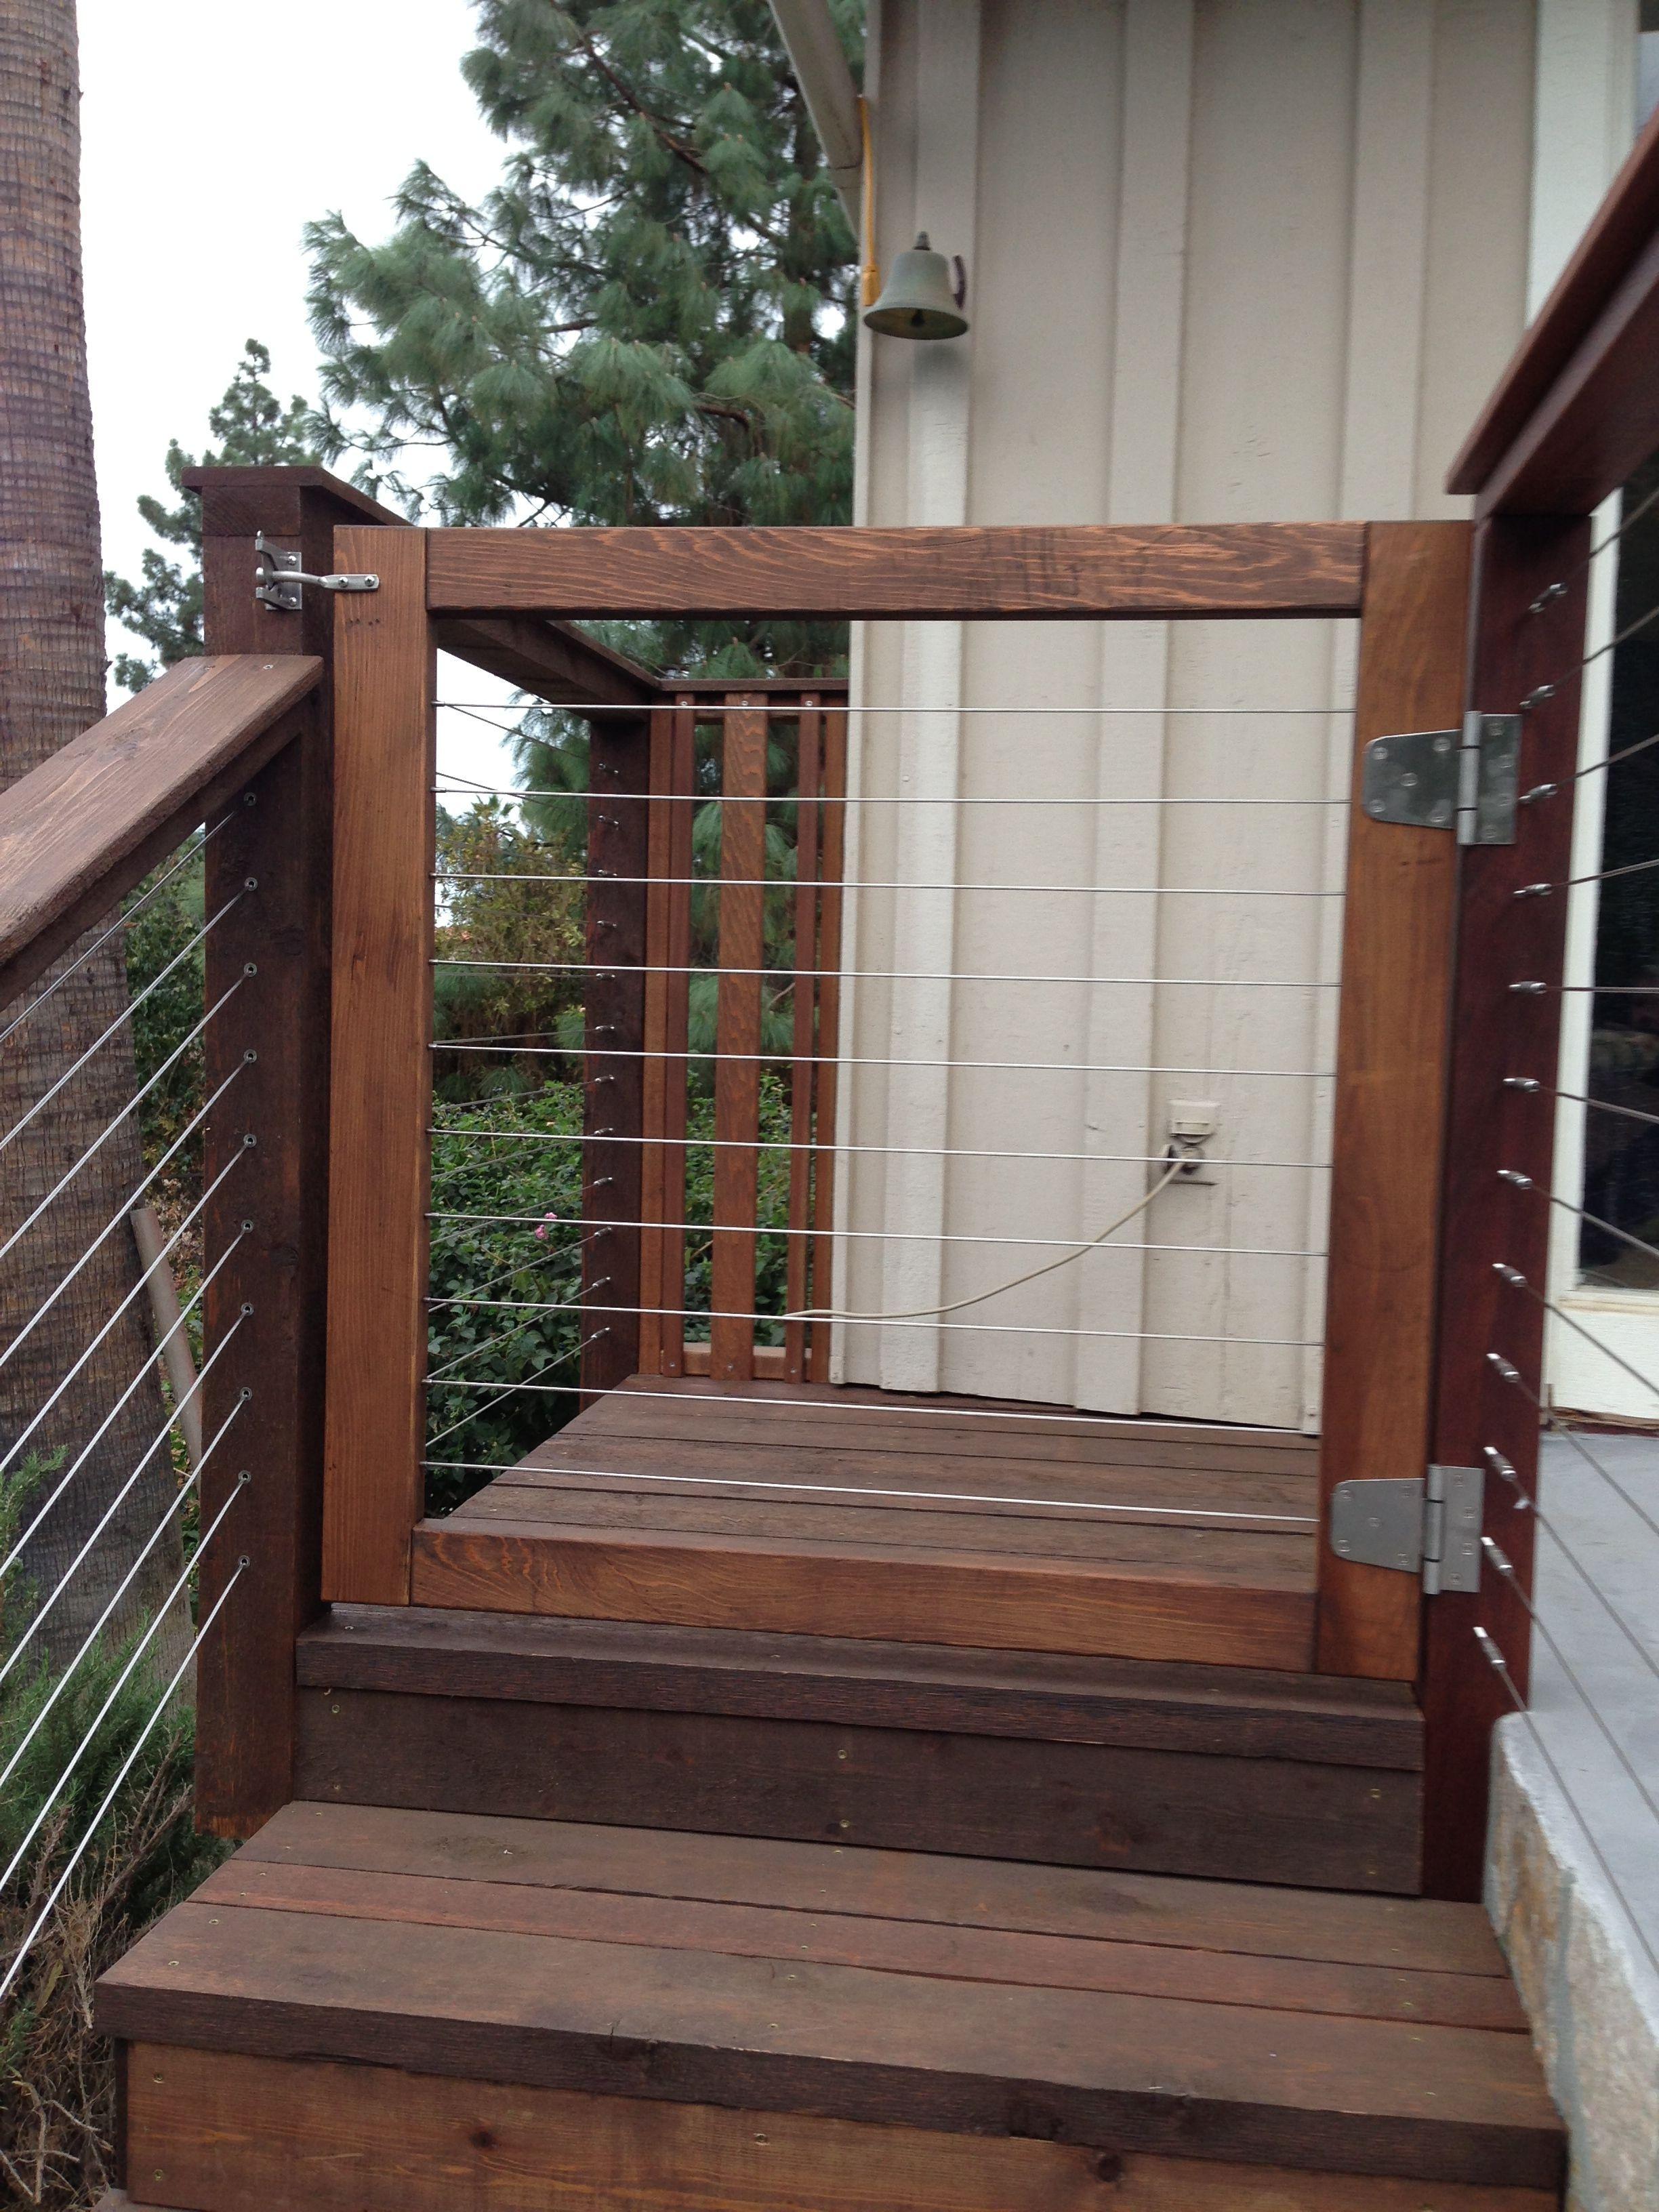 101 Diy Hog Wire Deck Railing With Images Building A Deck Diy Deck Patio Deck